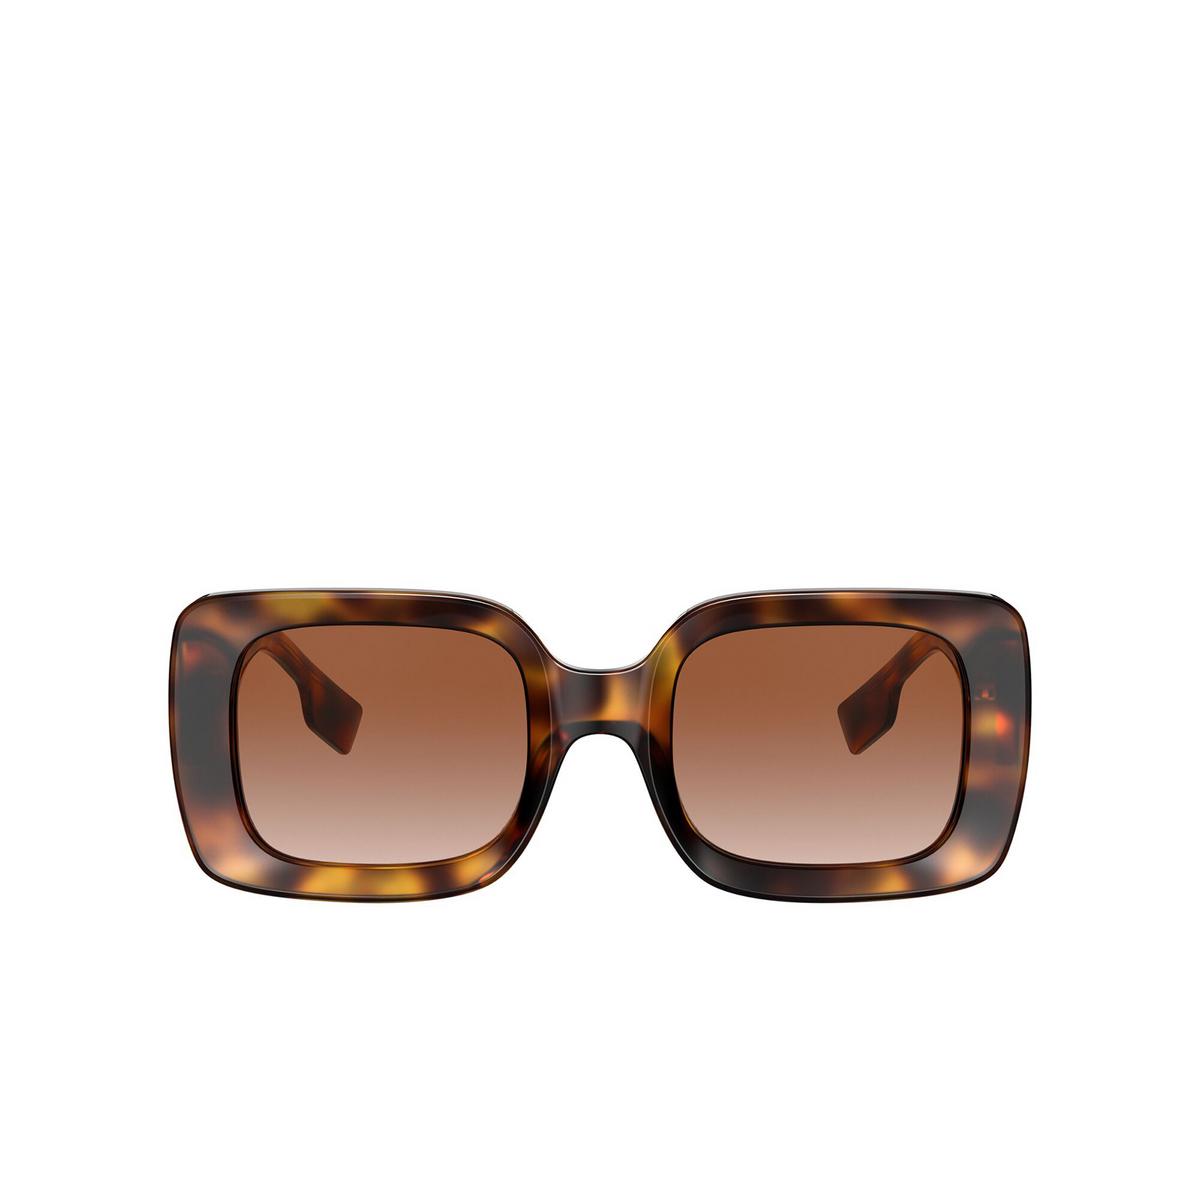 Burberry® Square Sunglasses: Delilah BE4327 color Light Havana 331613 - front view.